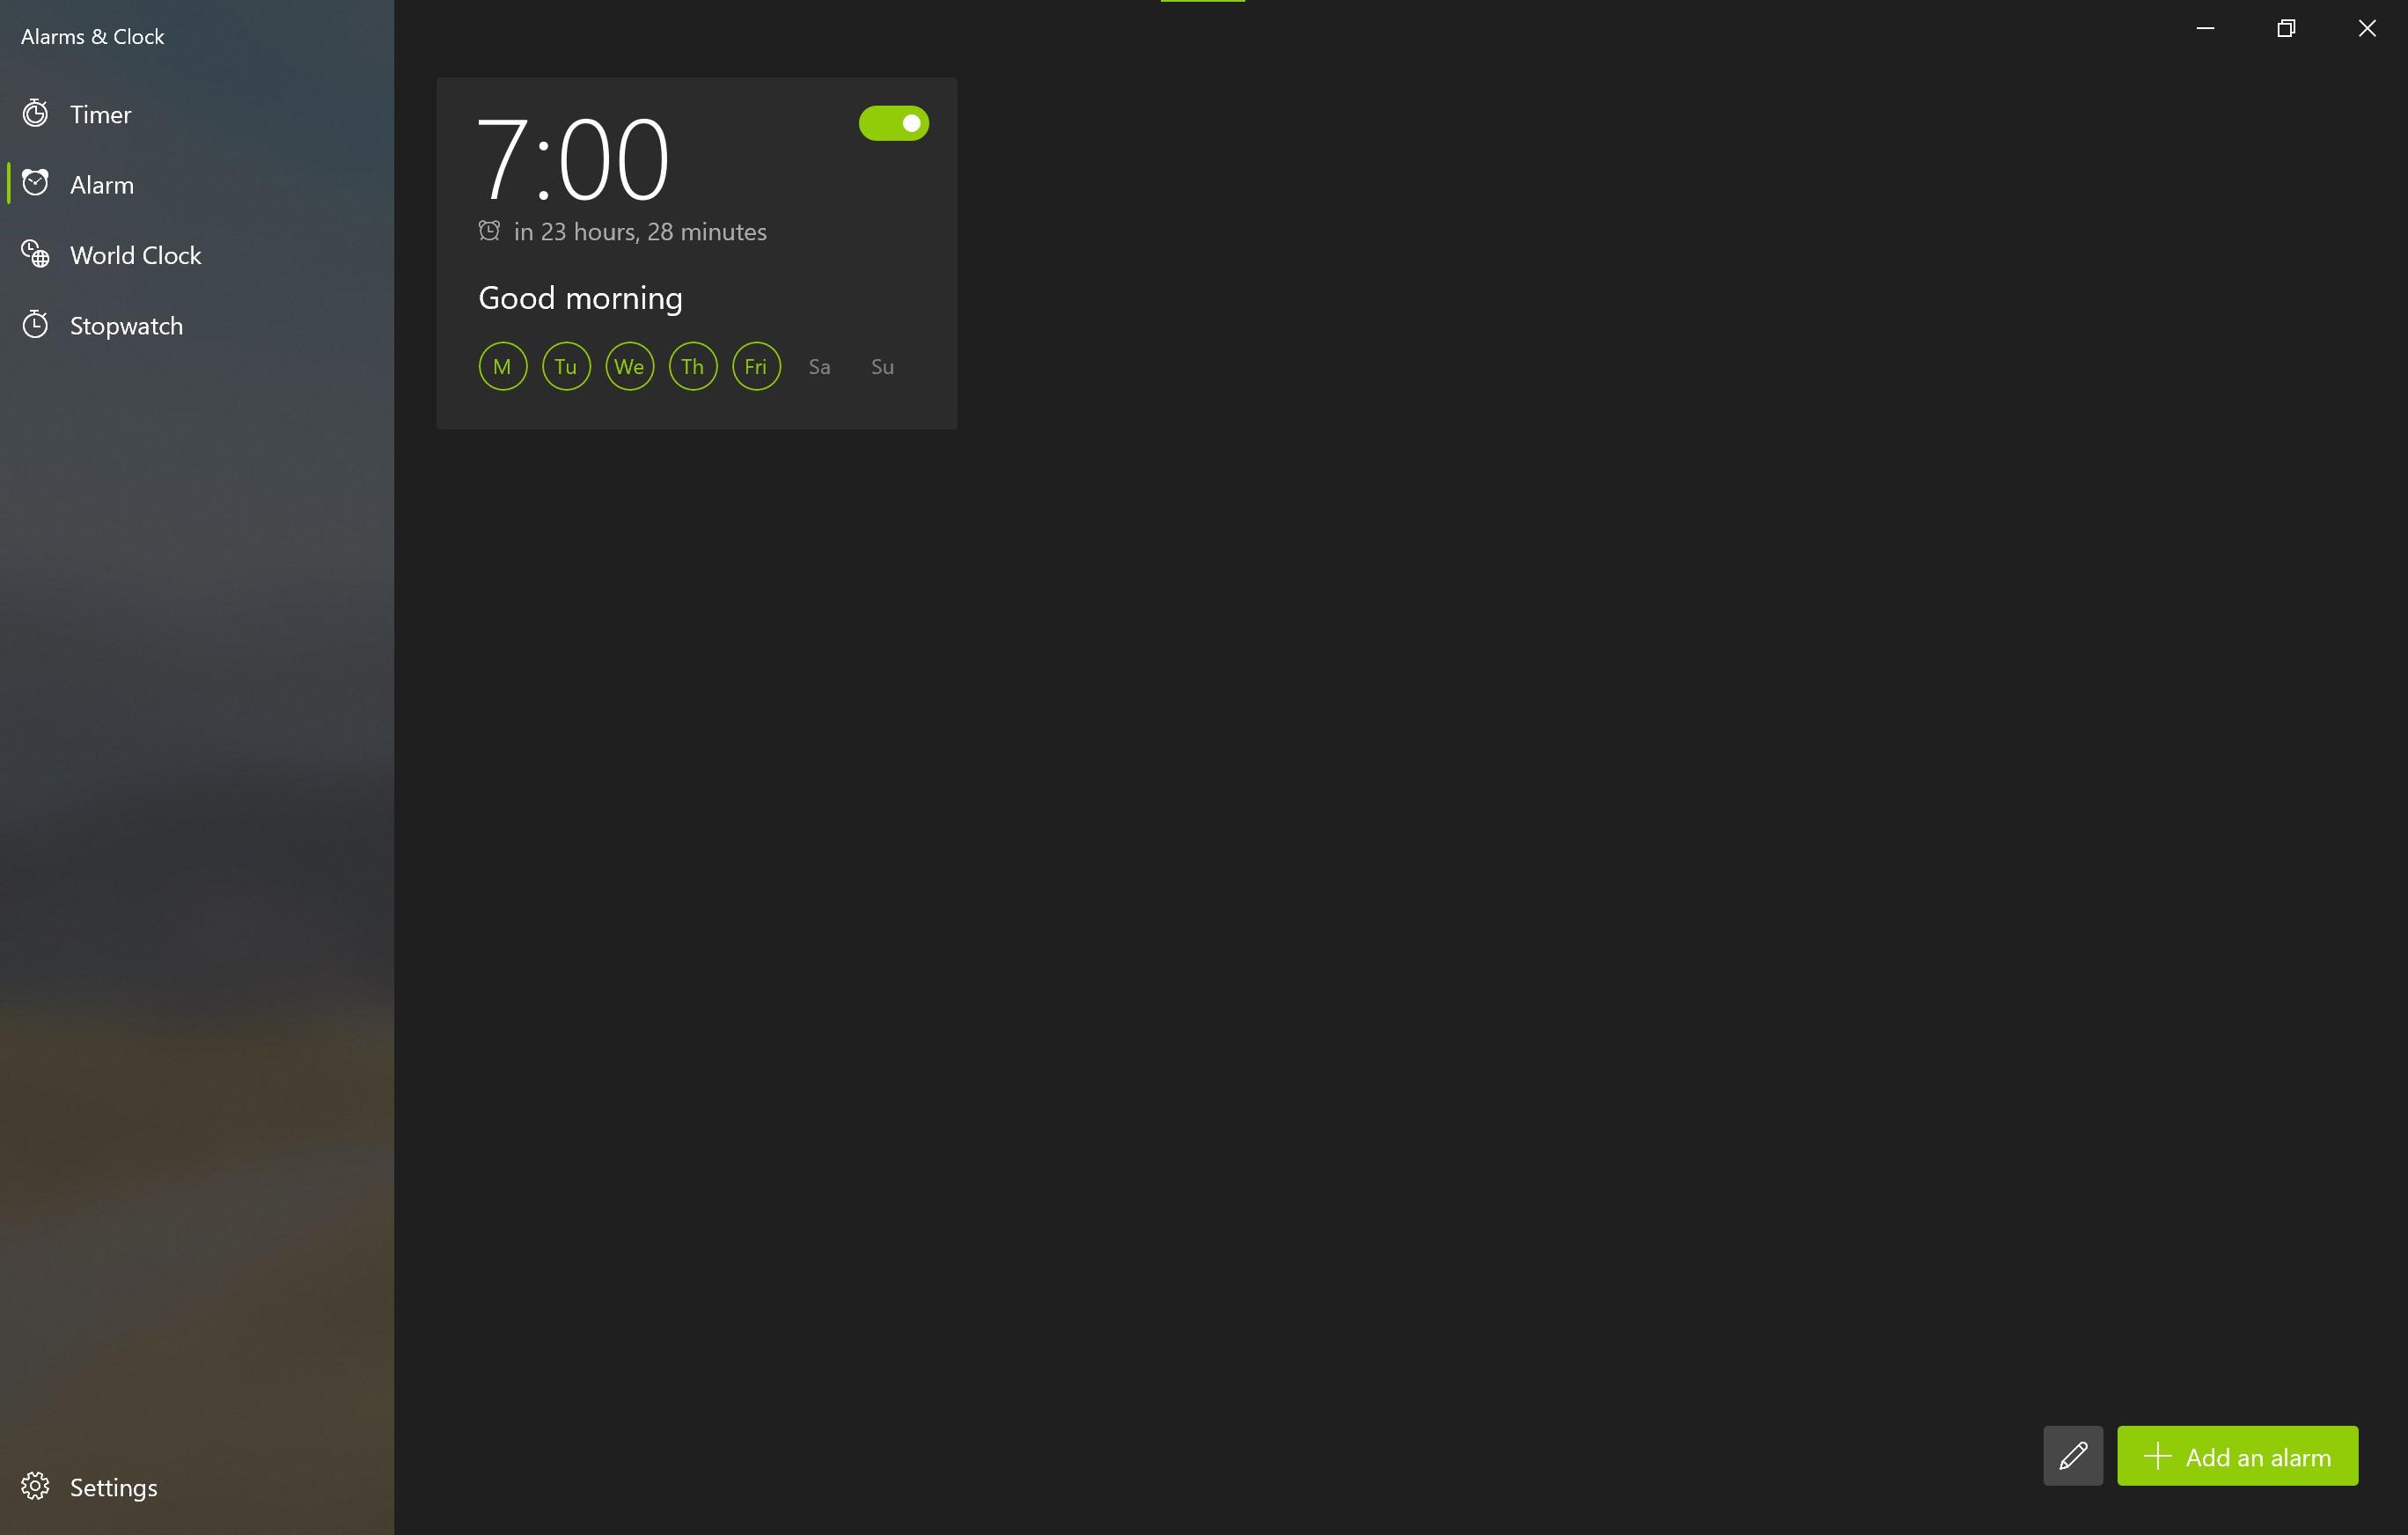 Alarms And Clocks Screenshot 4